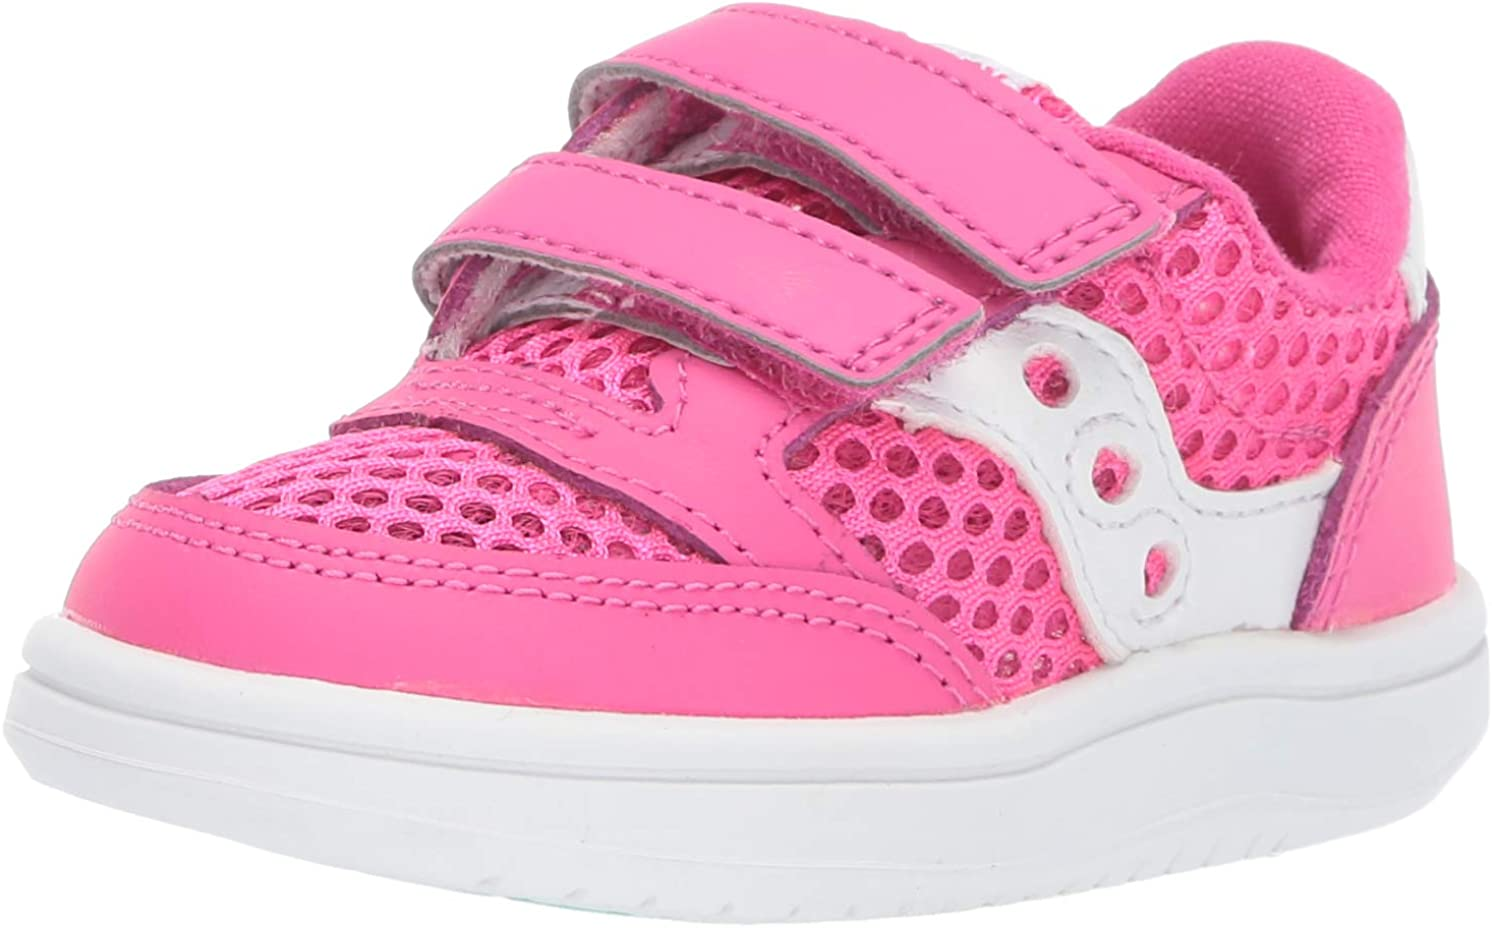 Saucony Unisex-Child Baby Court Sneaker 5% OFF Limited price sale Jazz